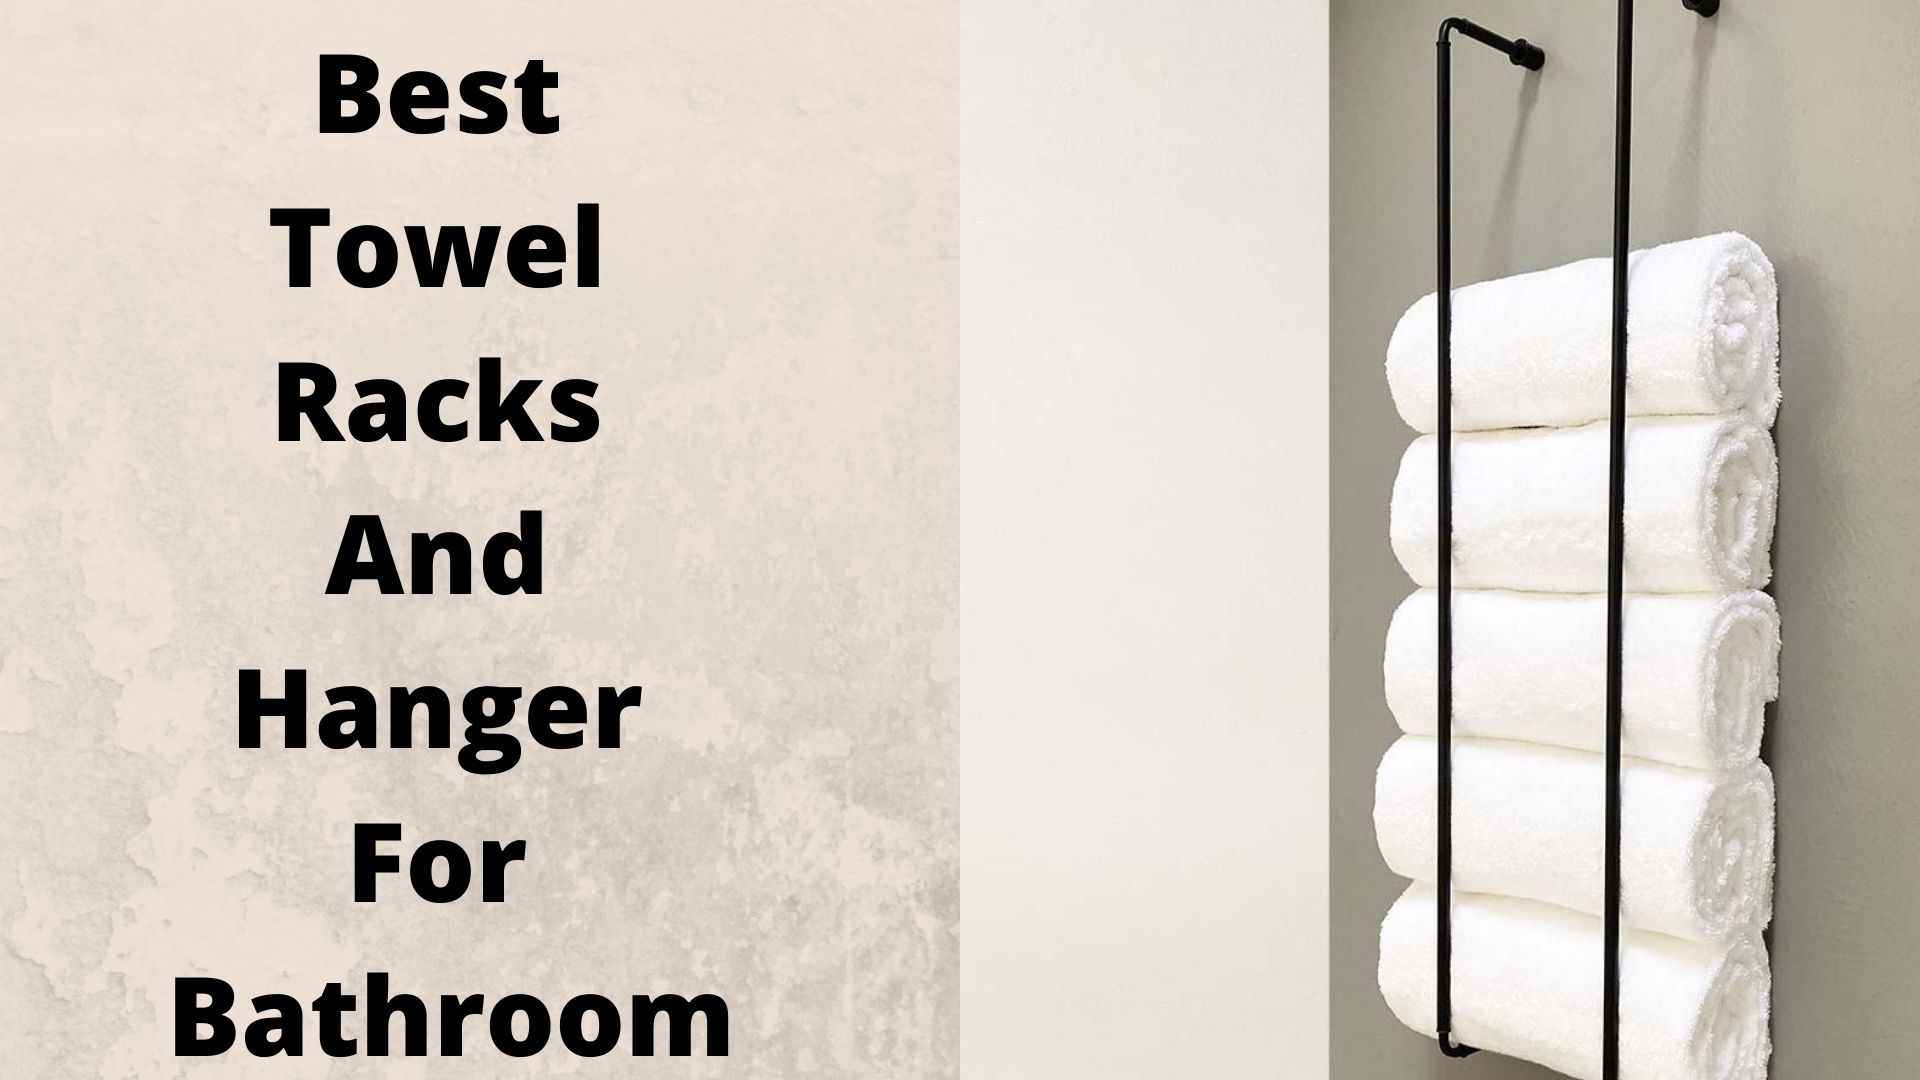 Best Towel Racks And Hanger For Bathroom -